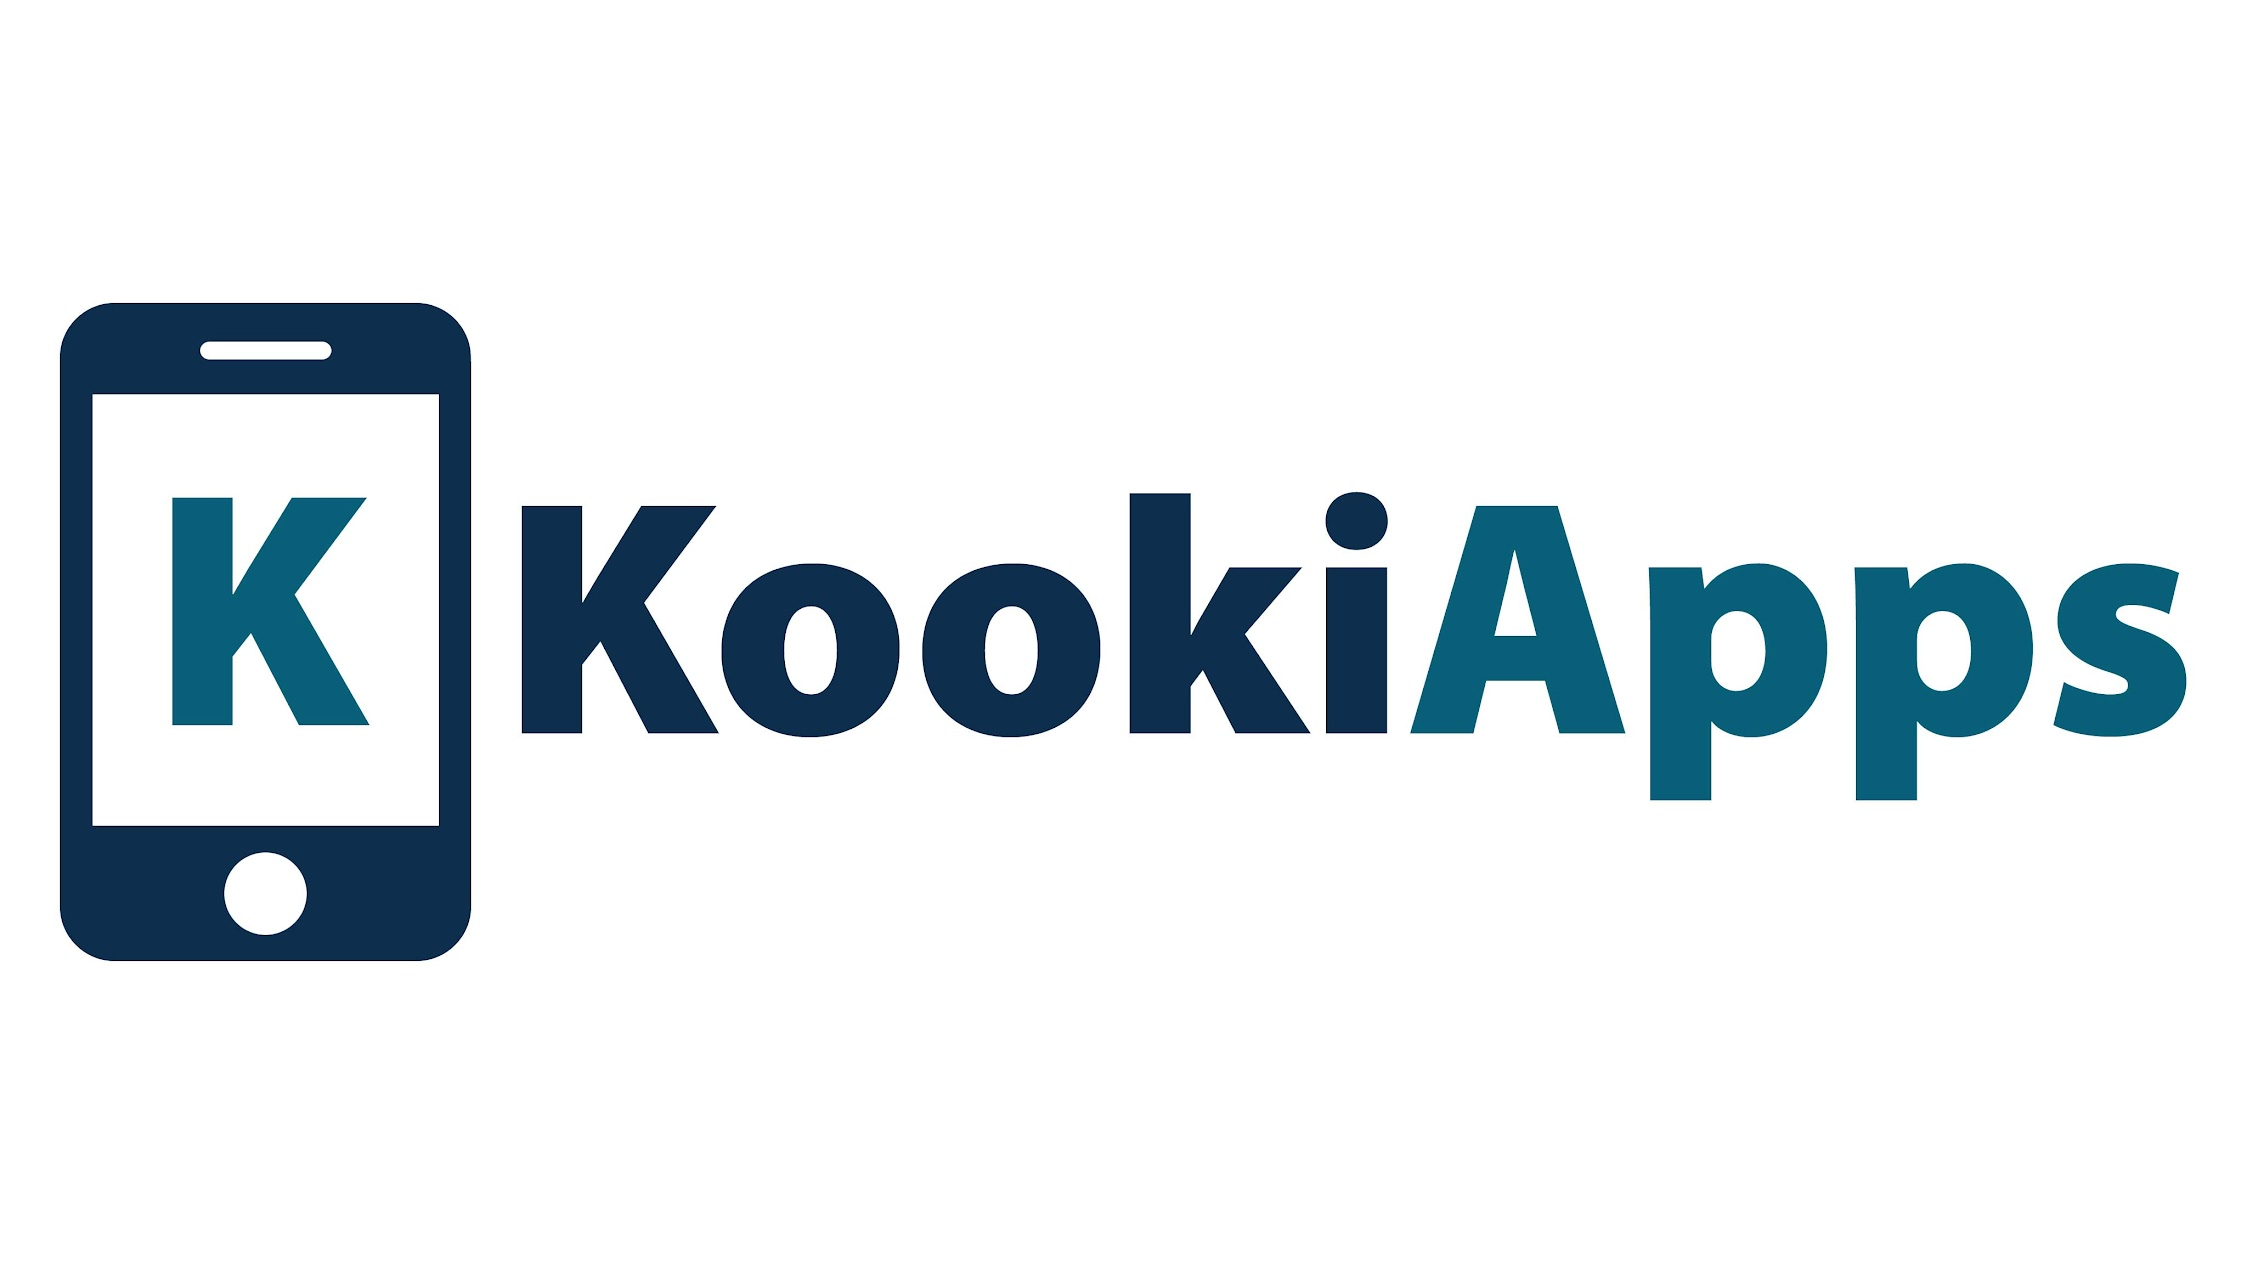 KookiApps